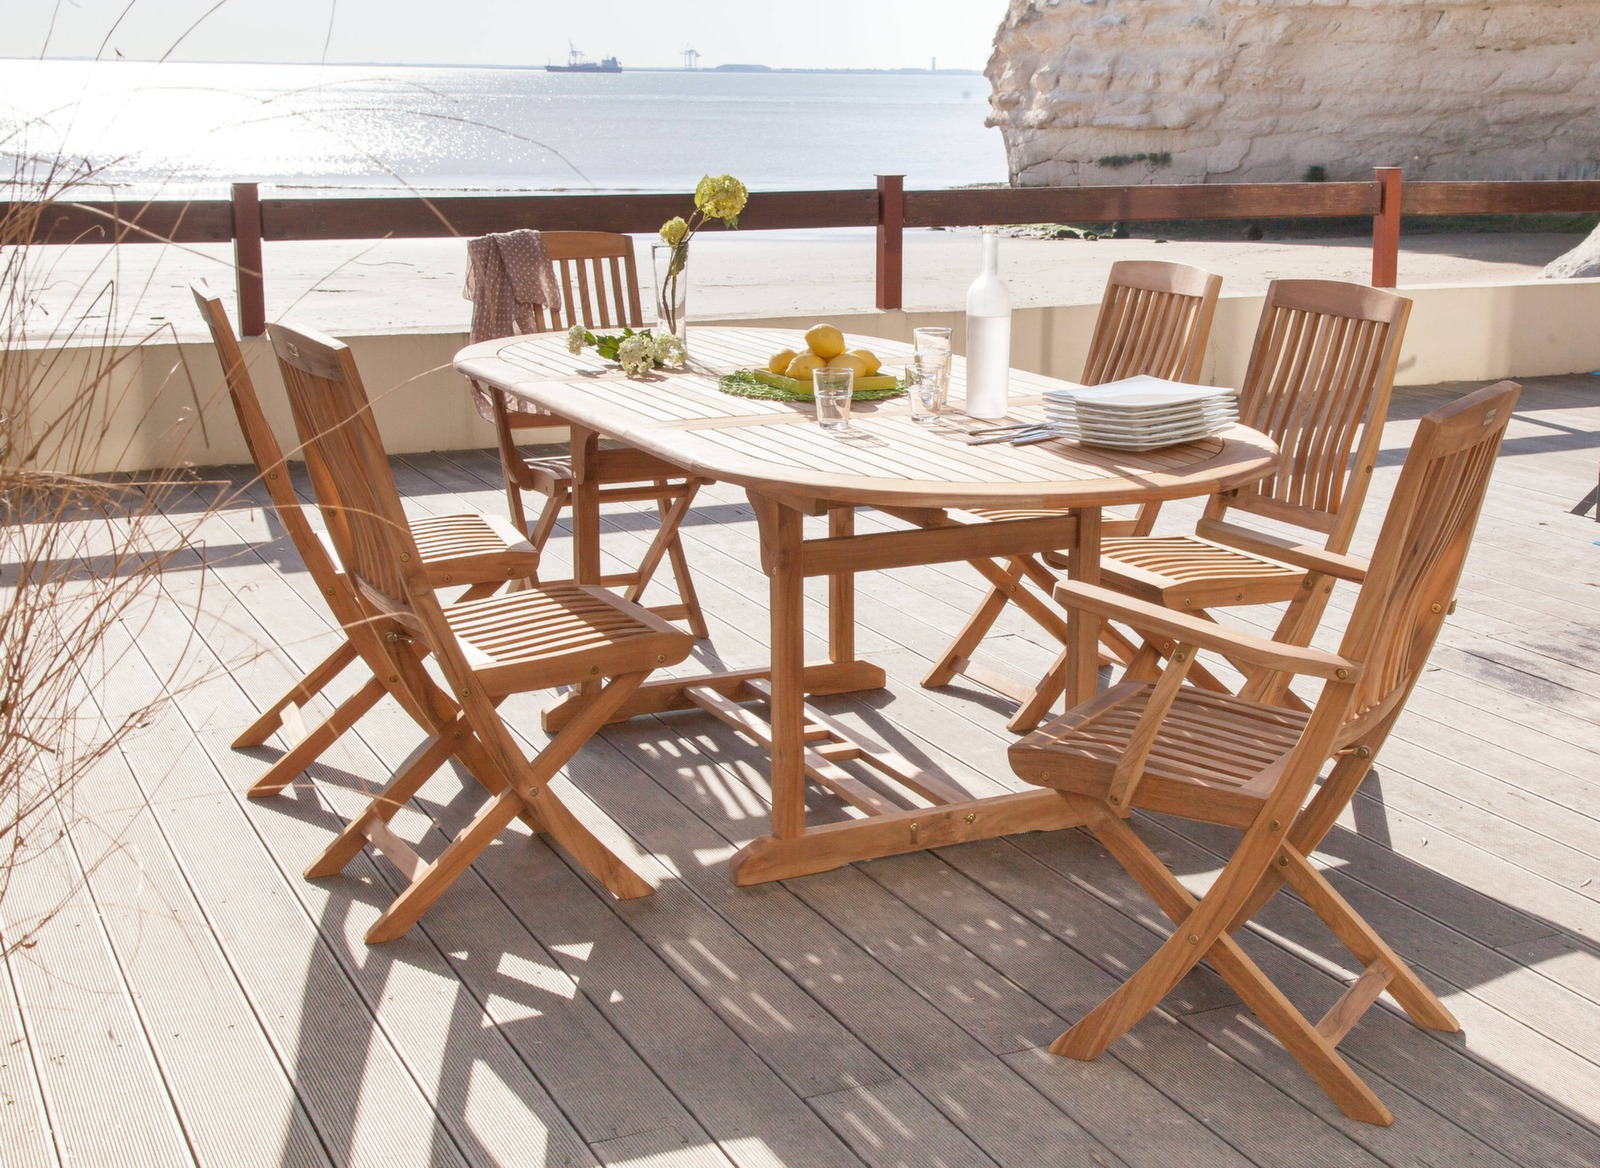 Table de jardin arrondie en teck Hampton - Gamme Alizé - Proloisirs